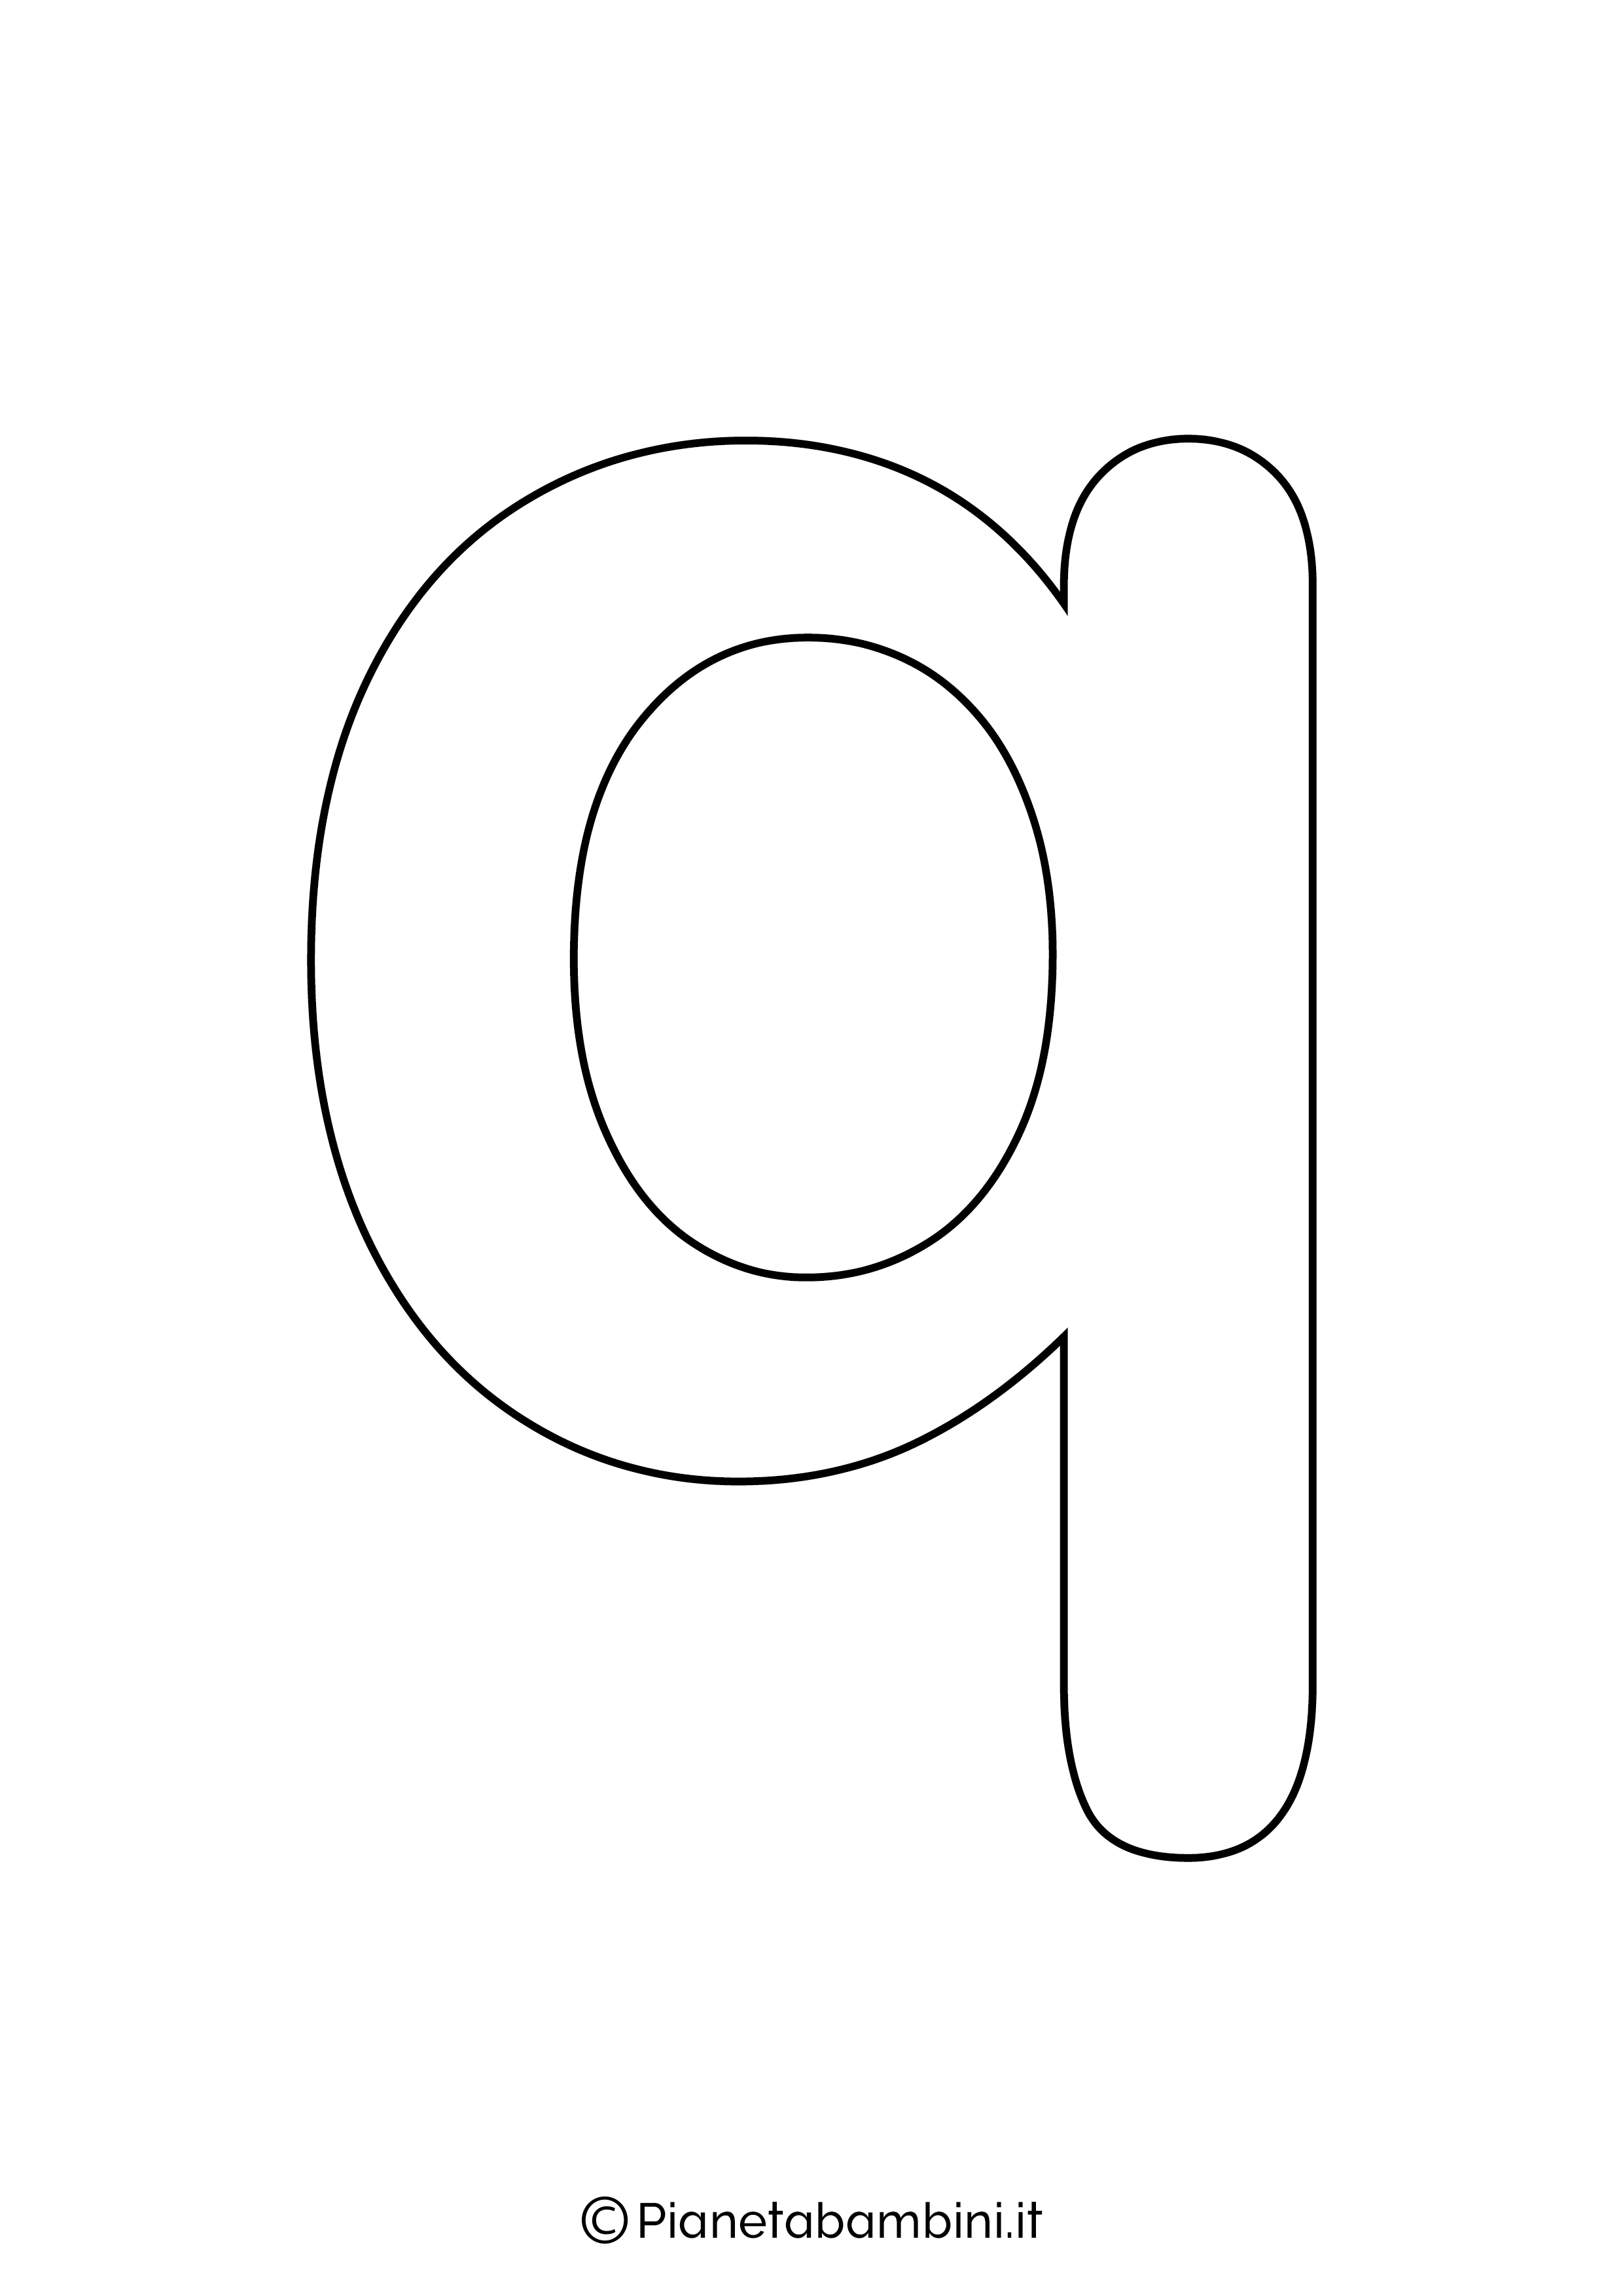 Lettera Q minuscola da stampare